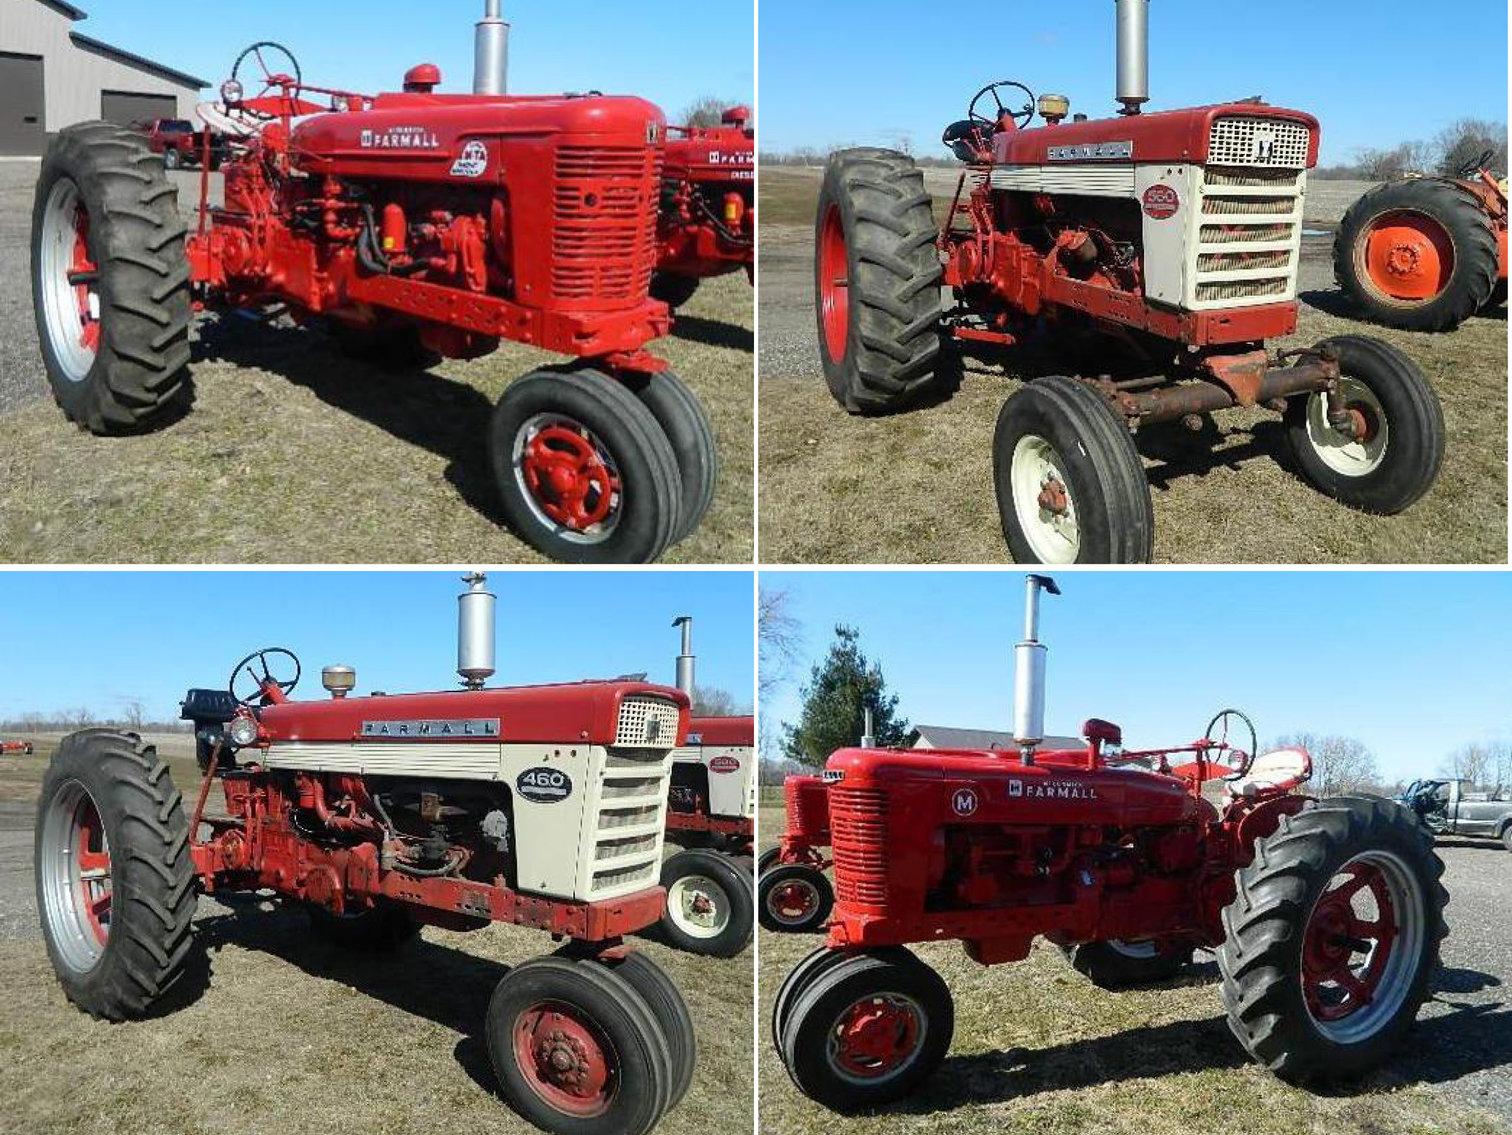 Farmall & Case Collector Tractors, Trucks, Mowers and Accessories